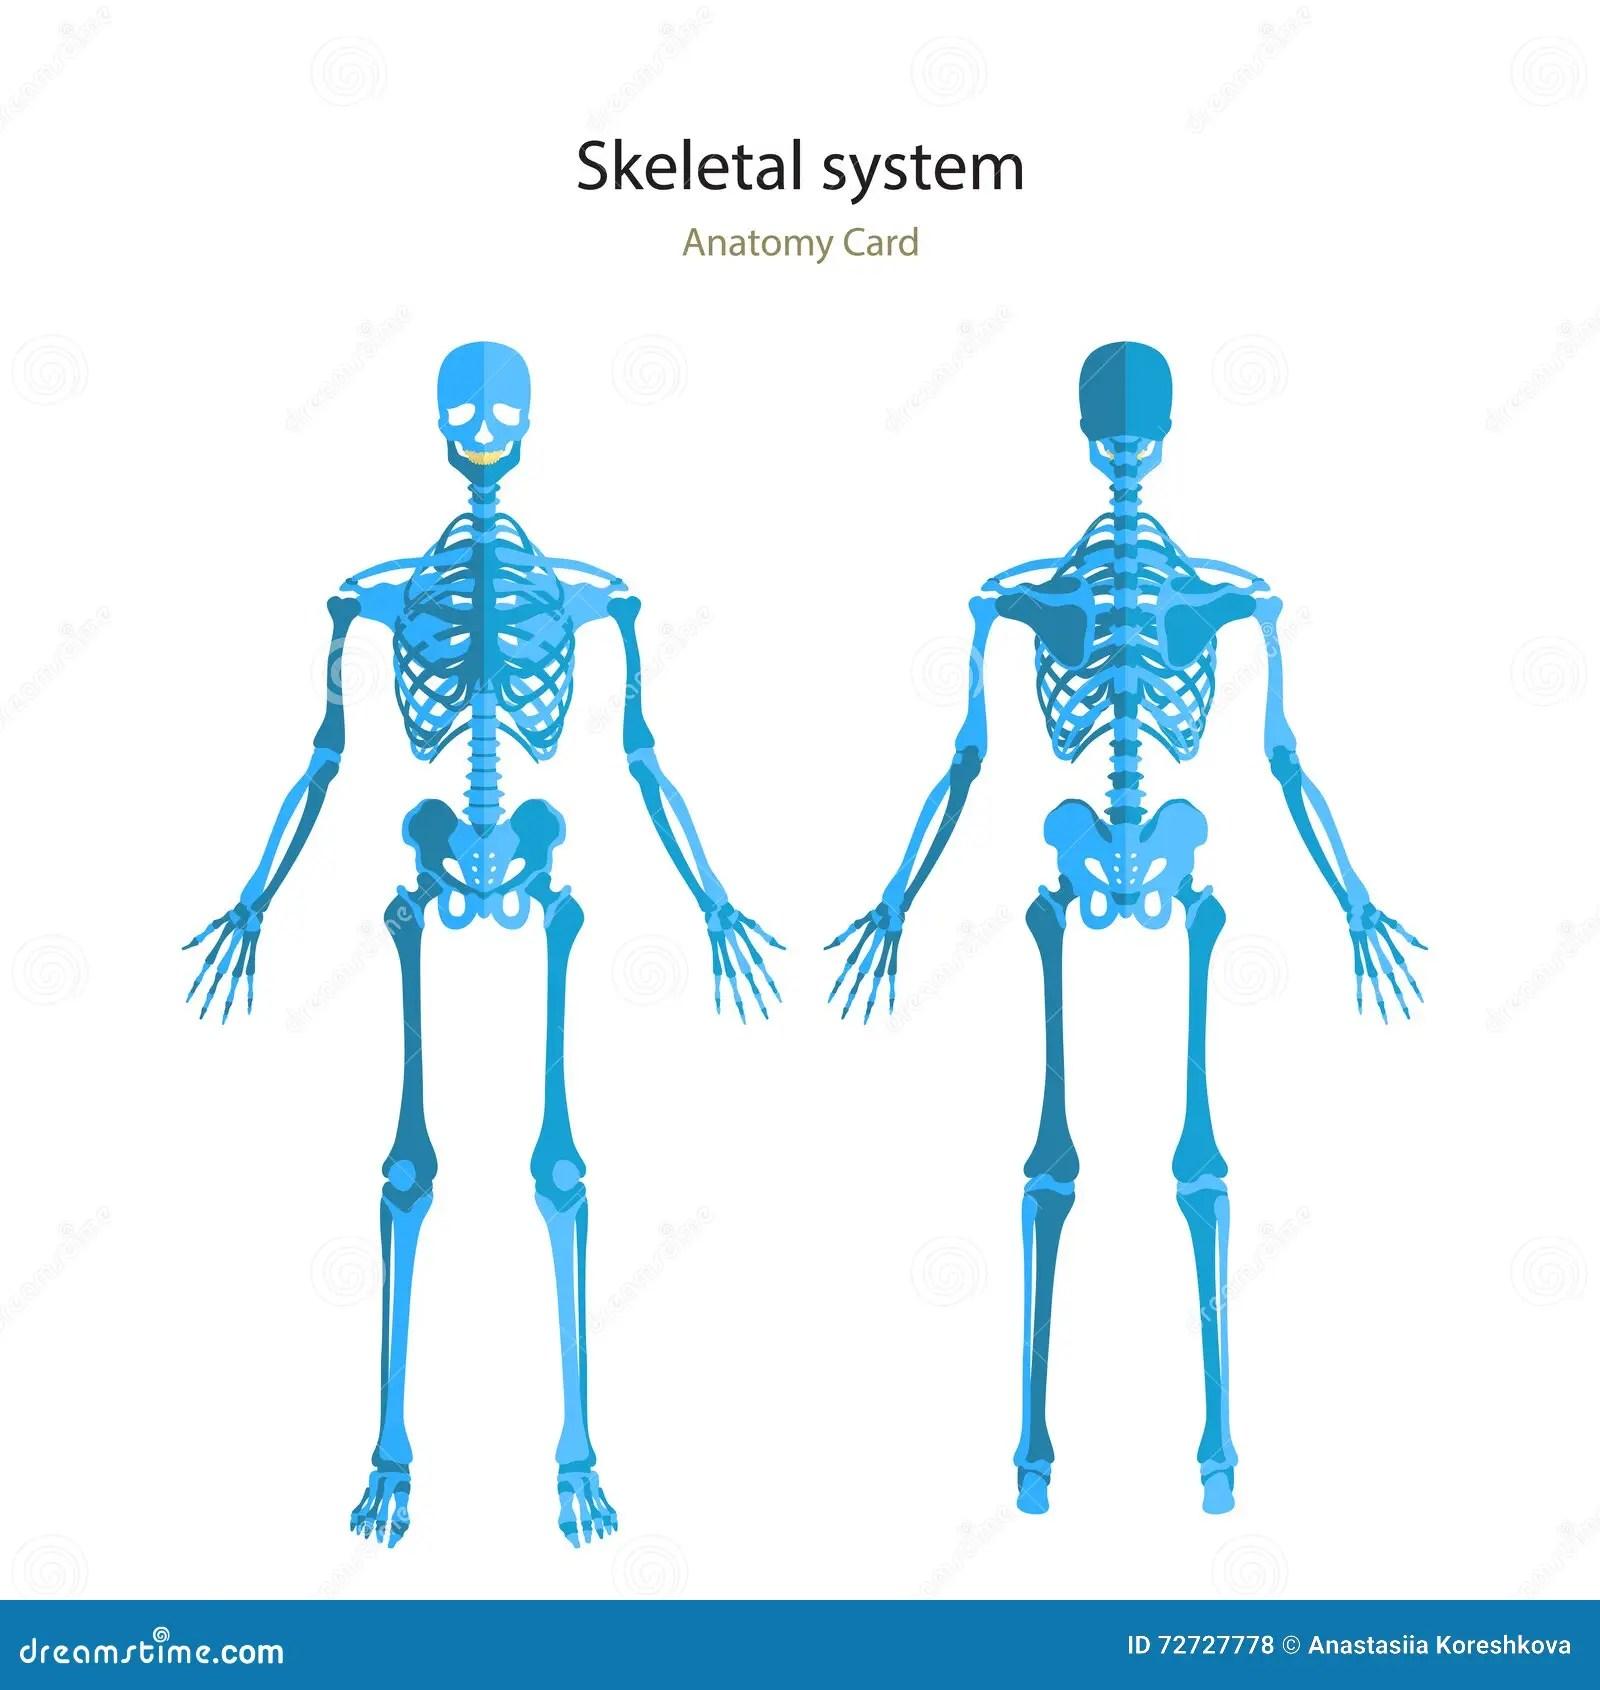 Torso Anatomy Human Skeletal Diagram